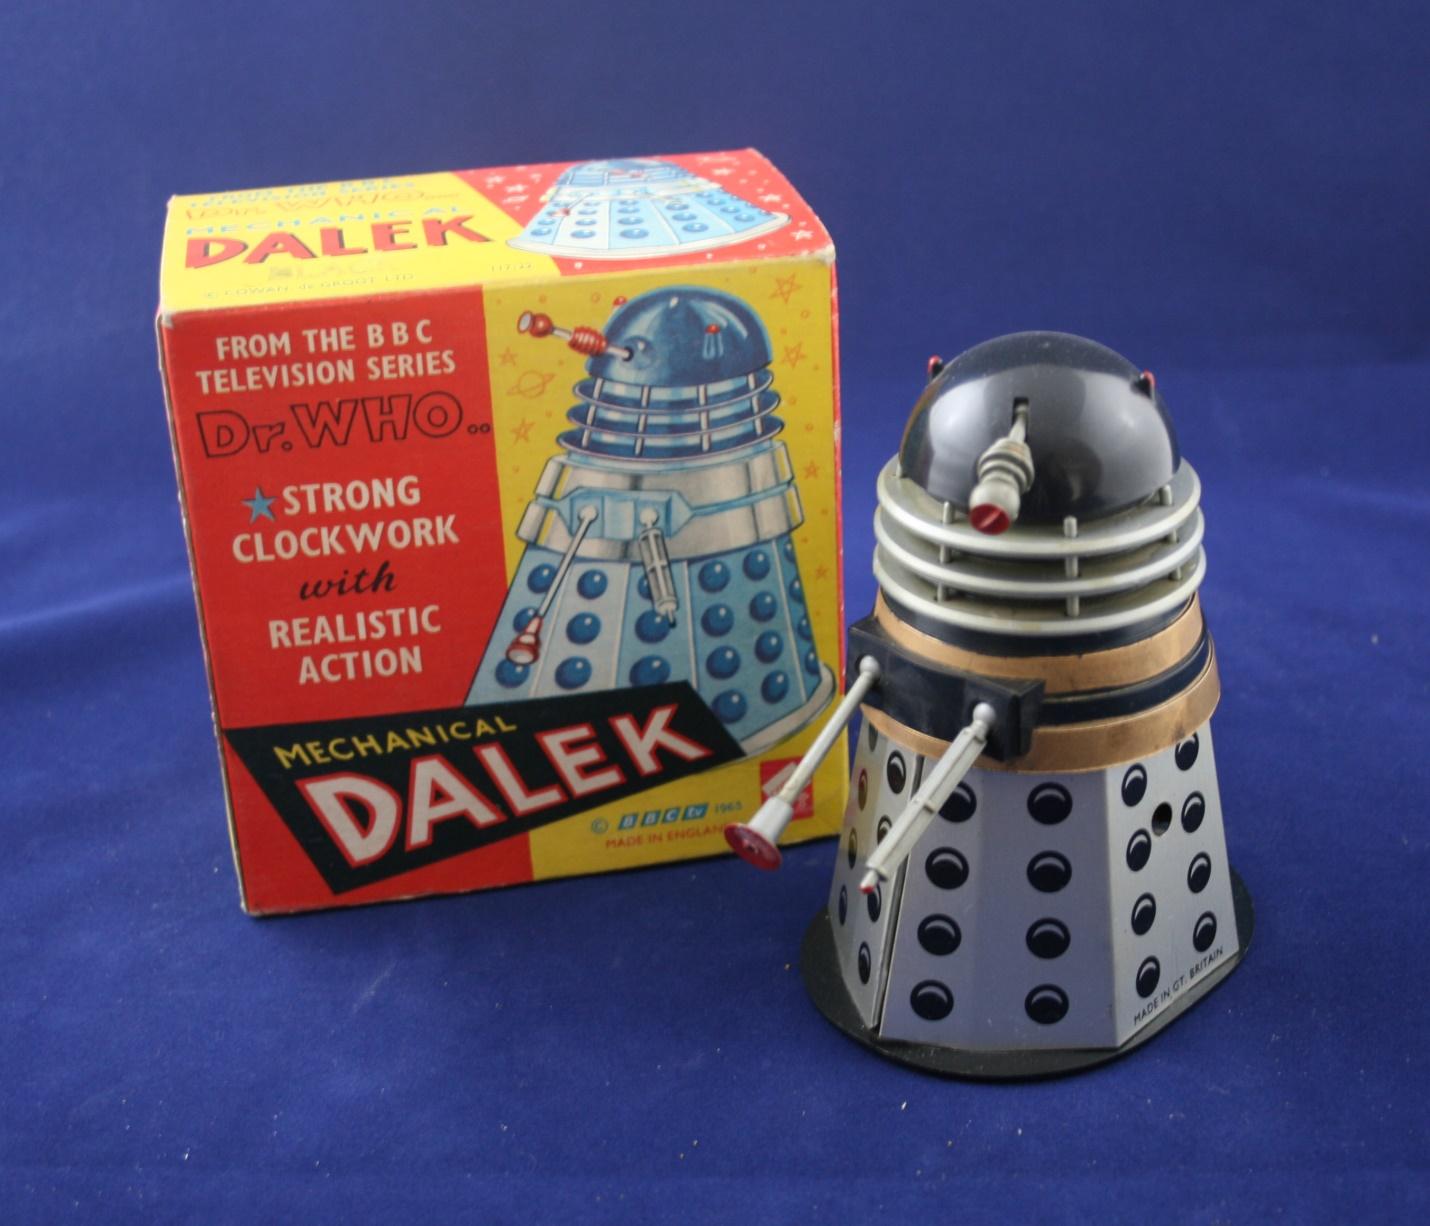 Codeg Toys, Black Mechanical Dalek, from Cowan, de Groot